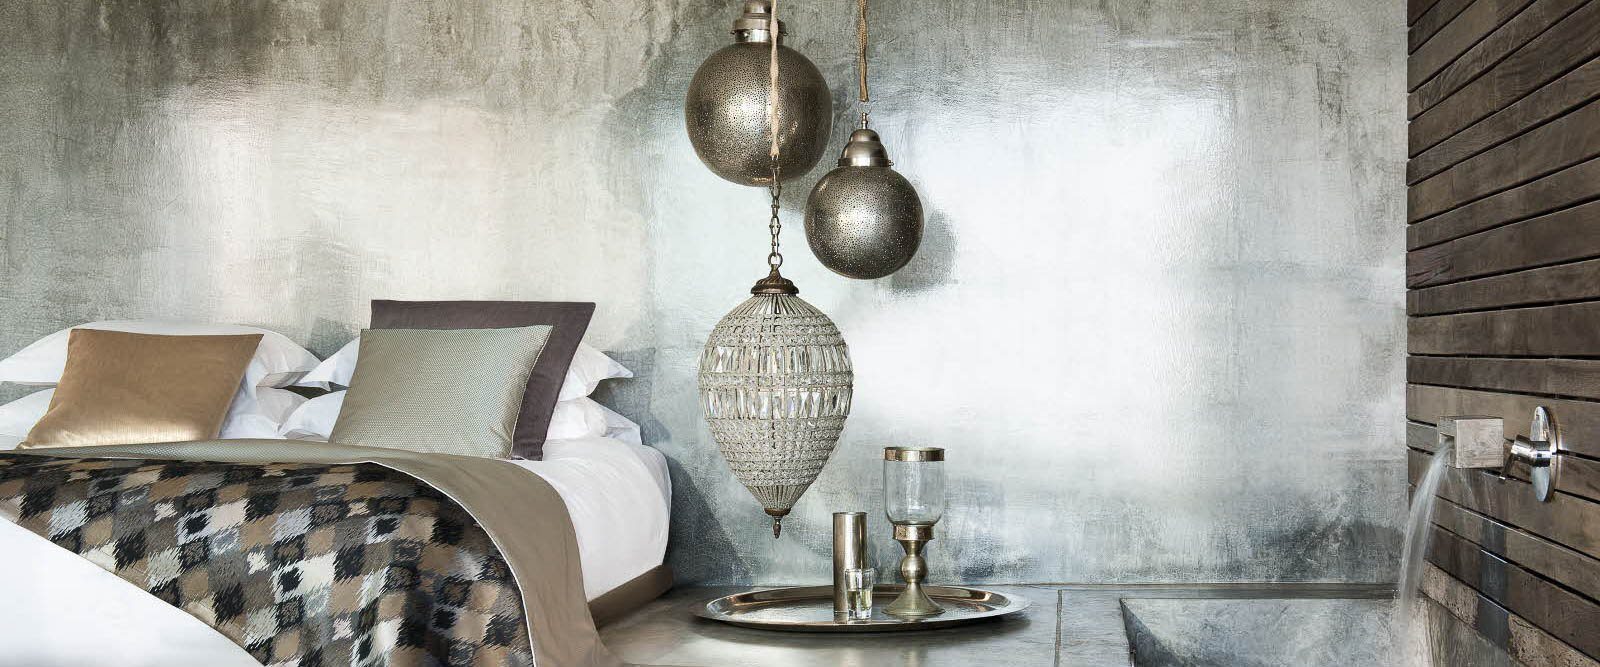 FROne_inherently_flameretardant_metallic_furnishing_fabrics_textile_upholstery_draperyinteriordes2